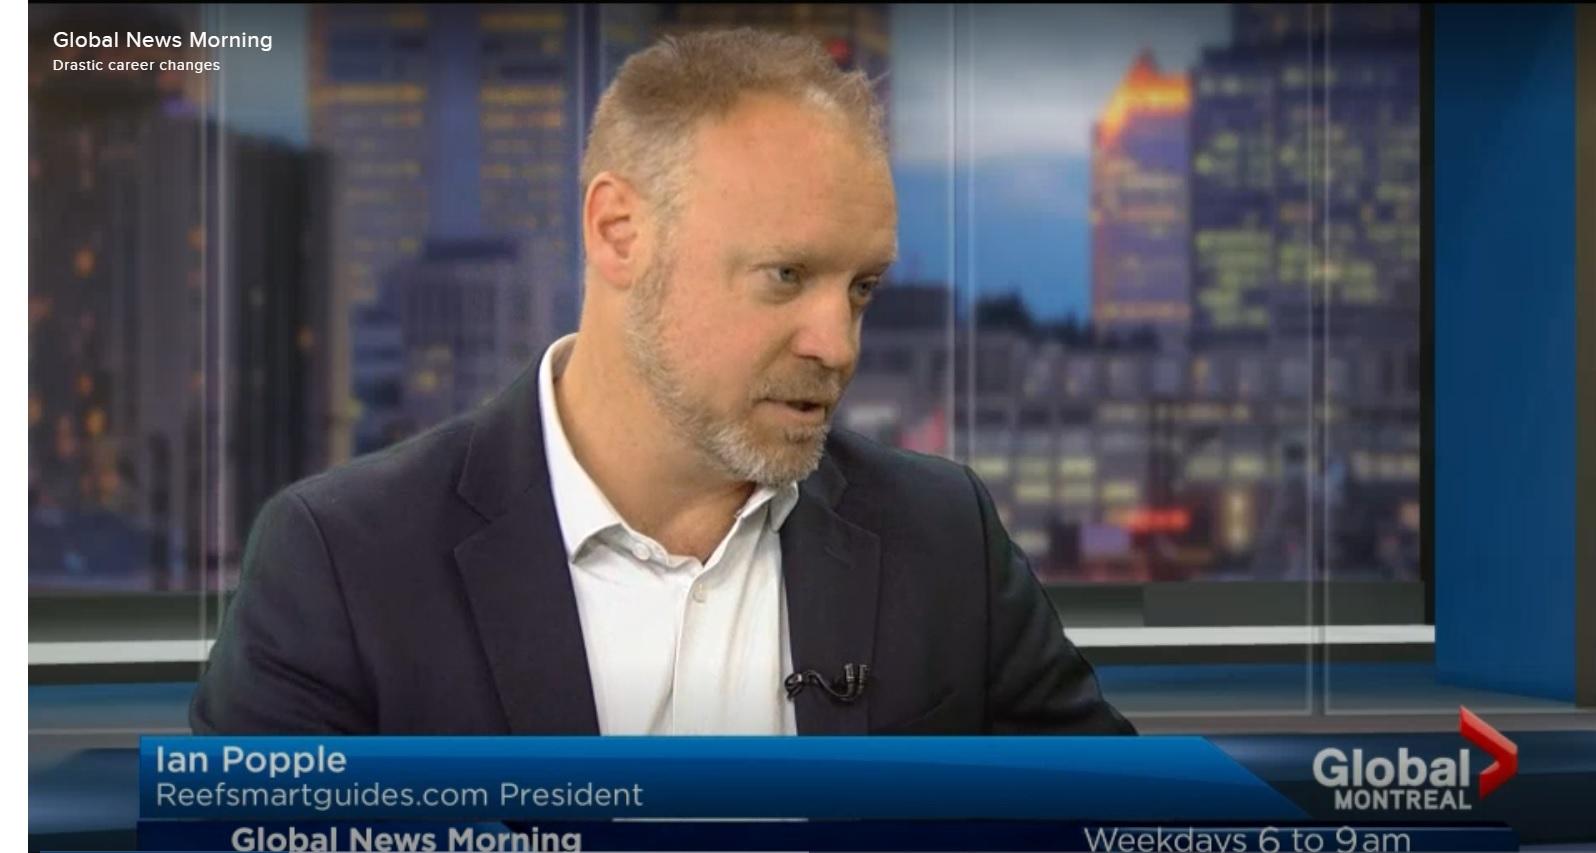 Ian Popple interviewed by Global TV News